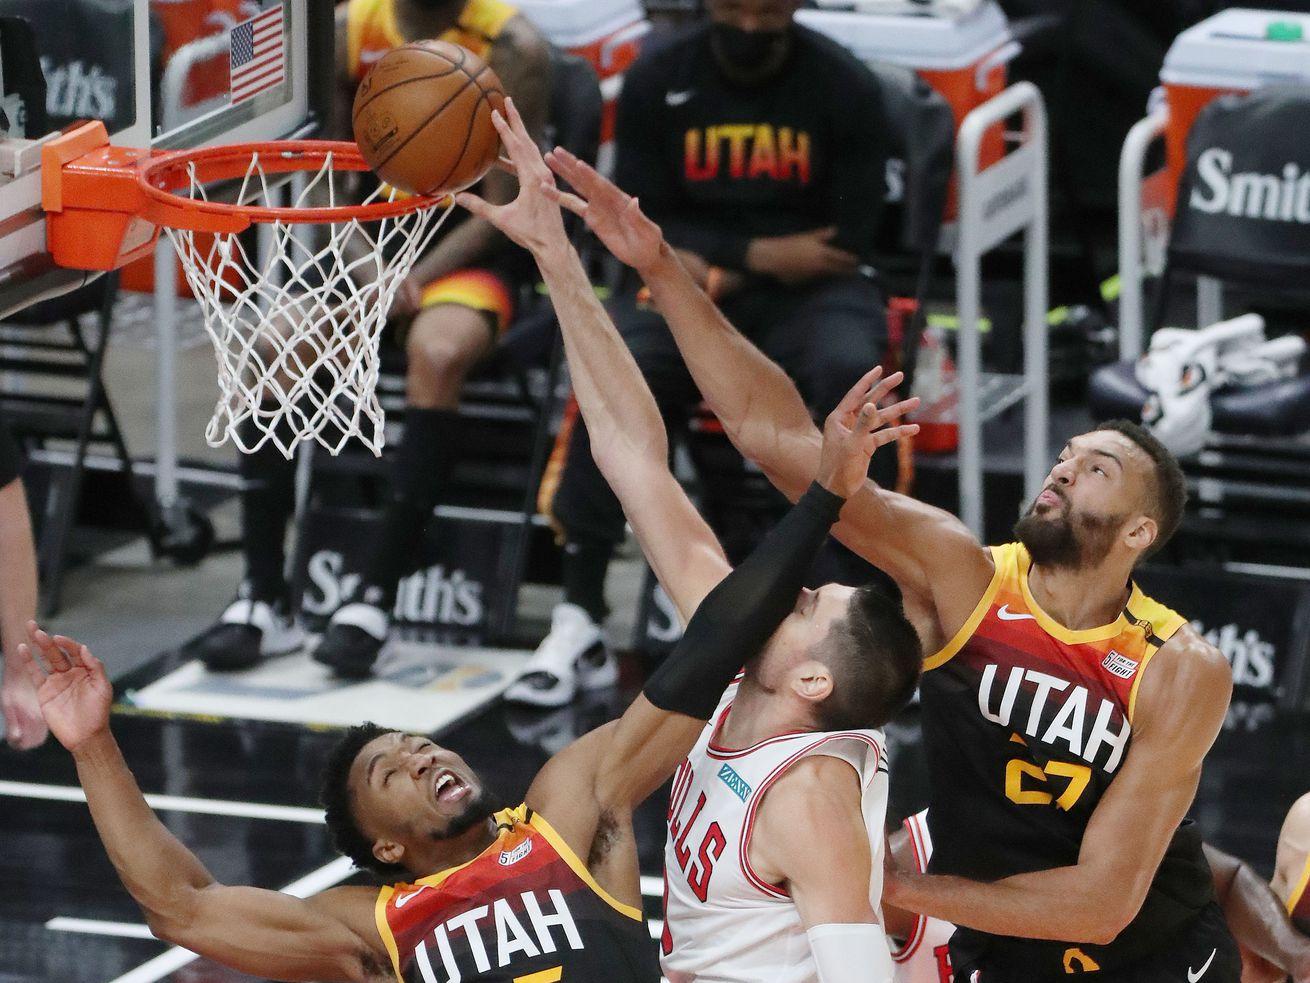 Utah Jazz guard Donovan Mitchell (45) and Utah Jazz center Rudy Gobert (27) defend Chicago Bulls center Nikola Vucevic (9) in Salt Lake City on Friday, April 2, 2021.